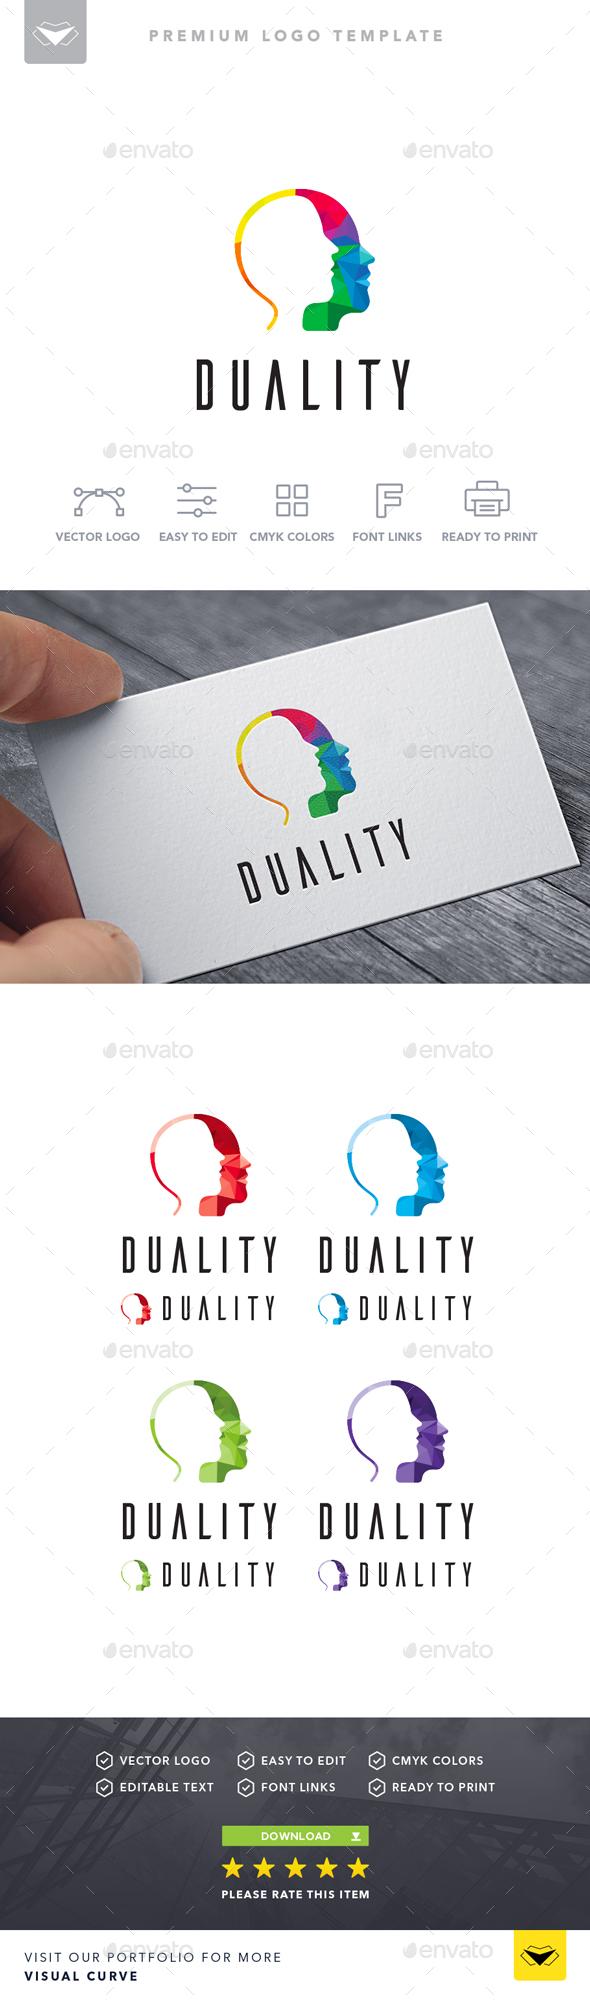 Duality Logo - Logo Templates